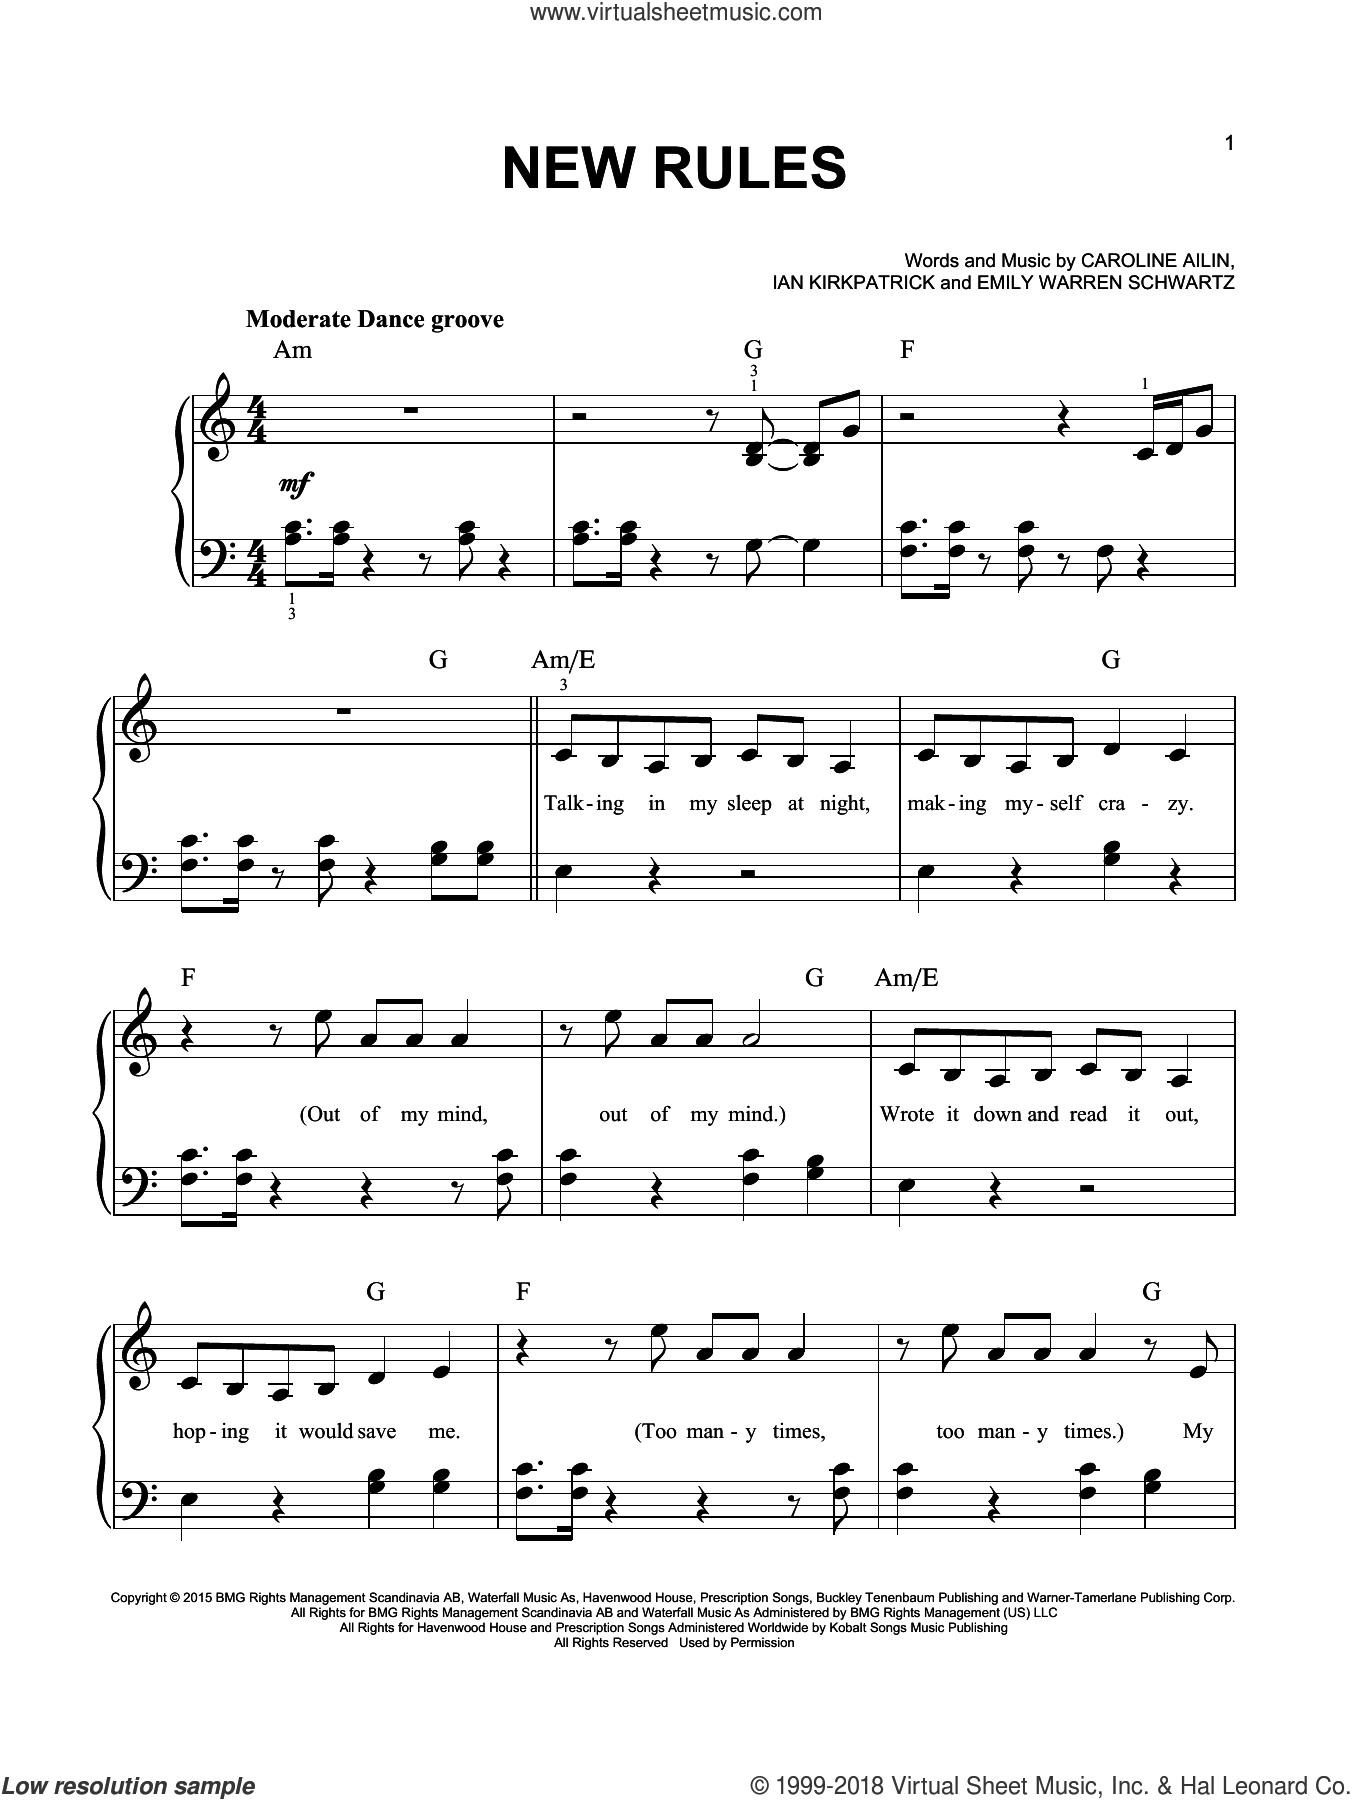 New Rules sheet music for piano solo by Dua Lipa, Caroline Ailin, Emily Warren Schwartz and Ian Kirkpatrick, easy skill level